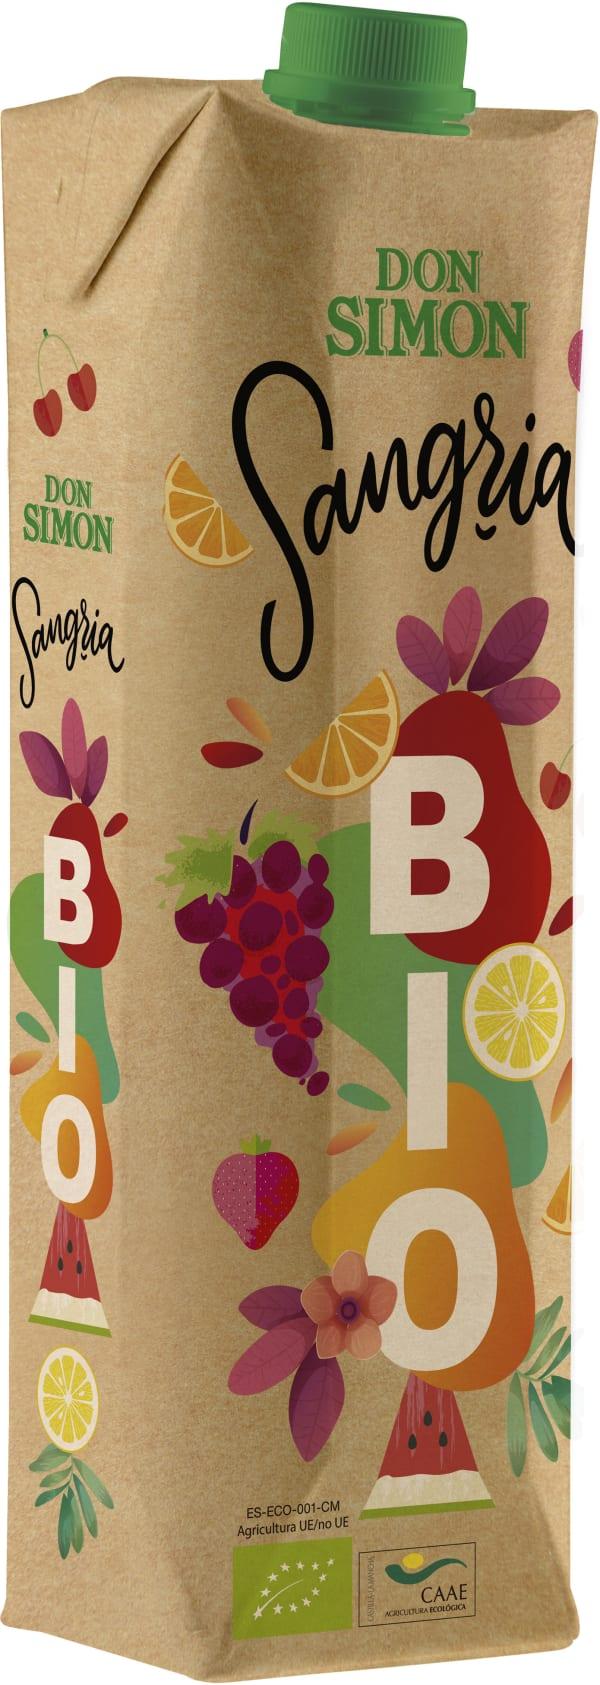 Don Simon Organic Sangria kartongförpackning